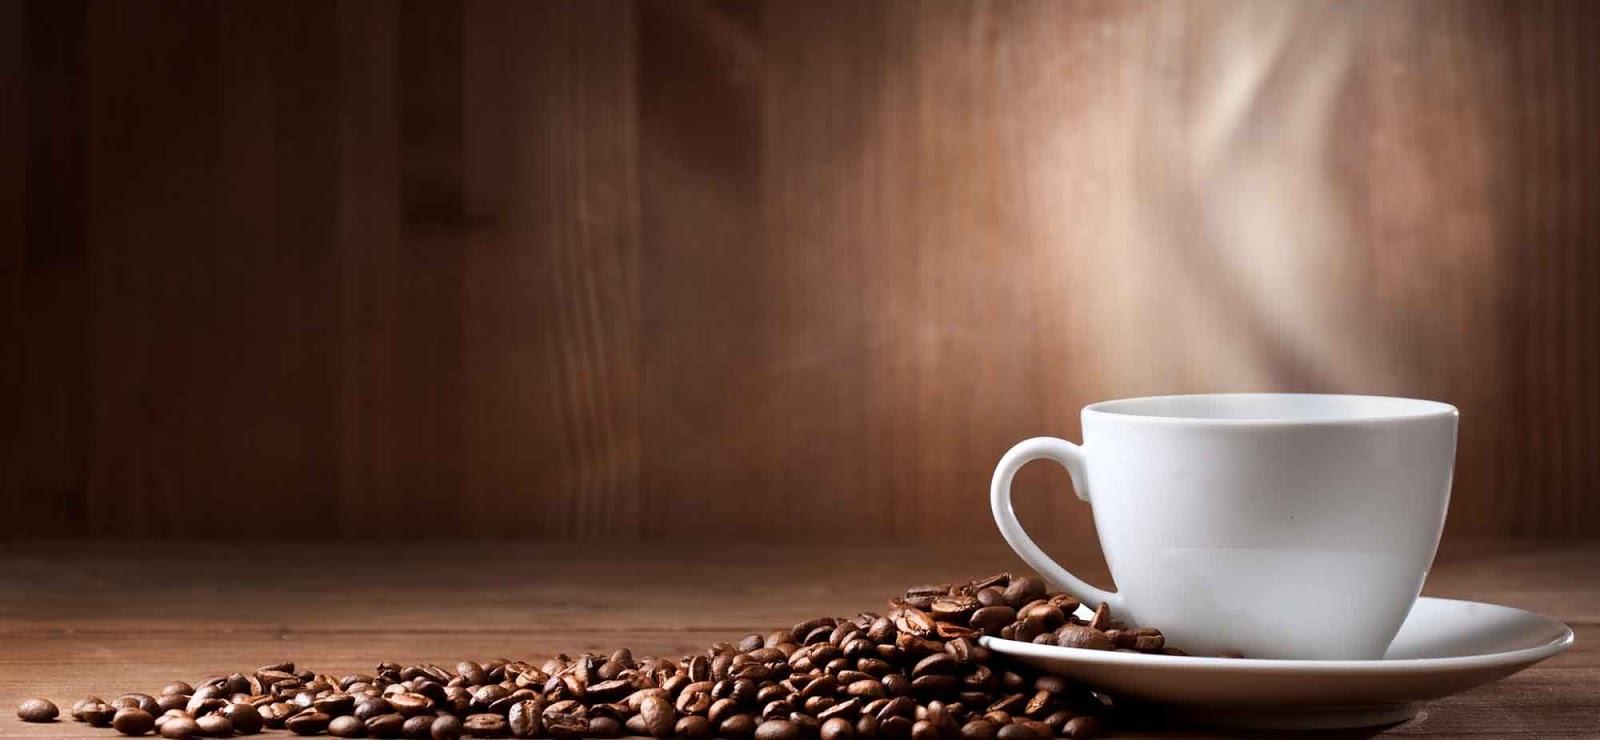 photo coffee_slide_zps7sst2grd.jpg